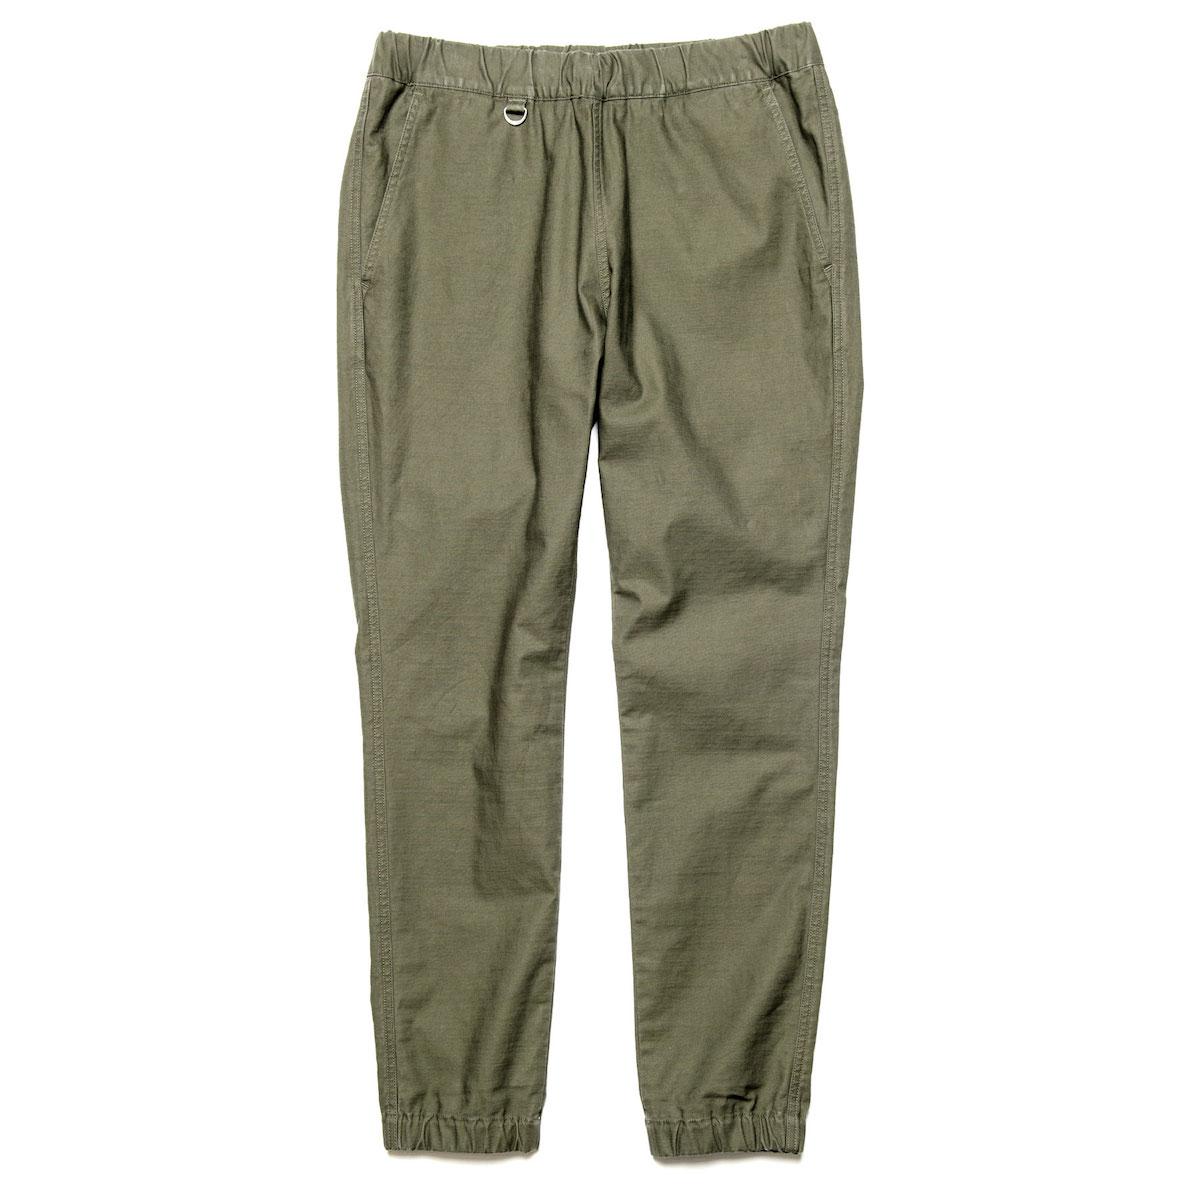 uniform experiment / SLIM-FIT JOGGER PANT-olive